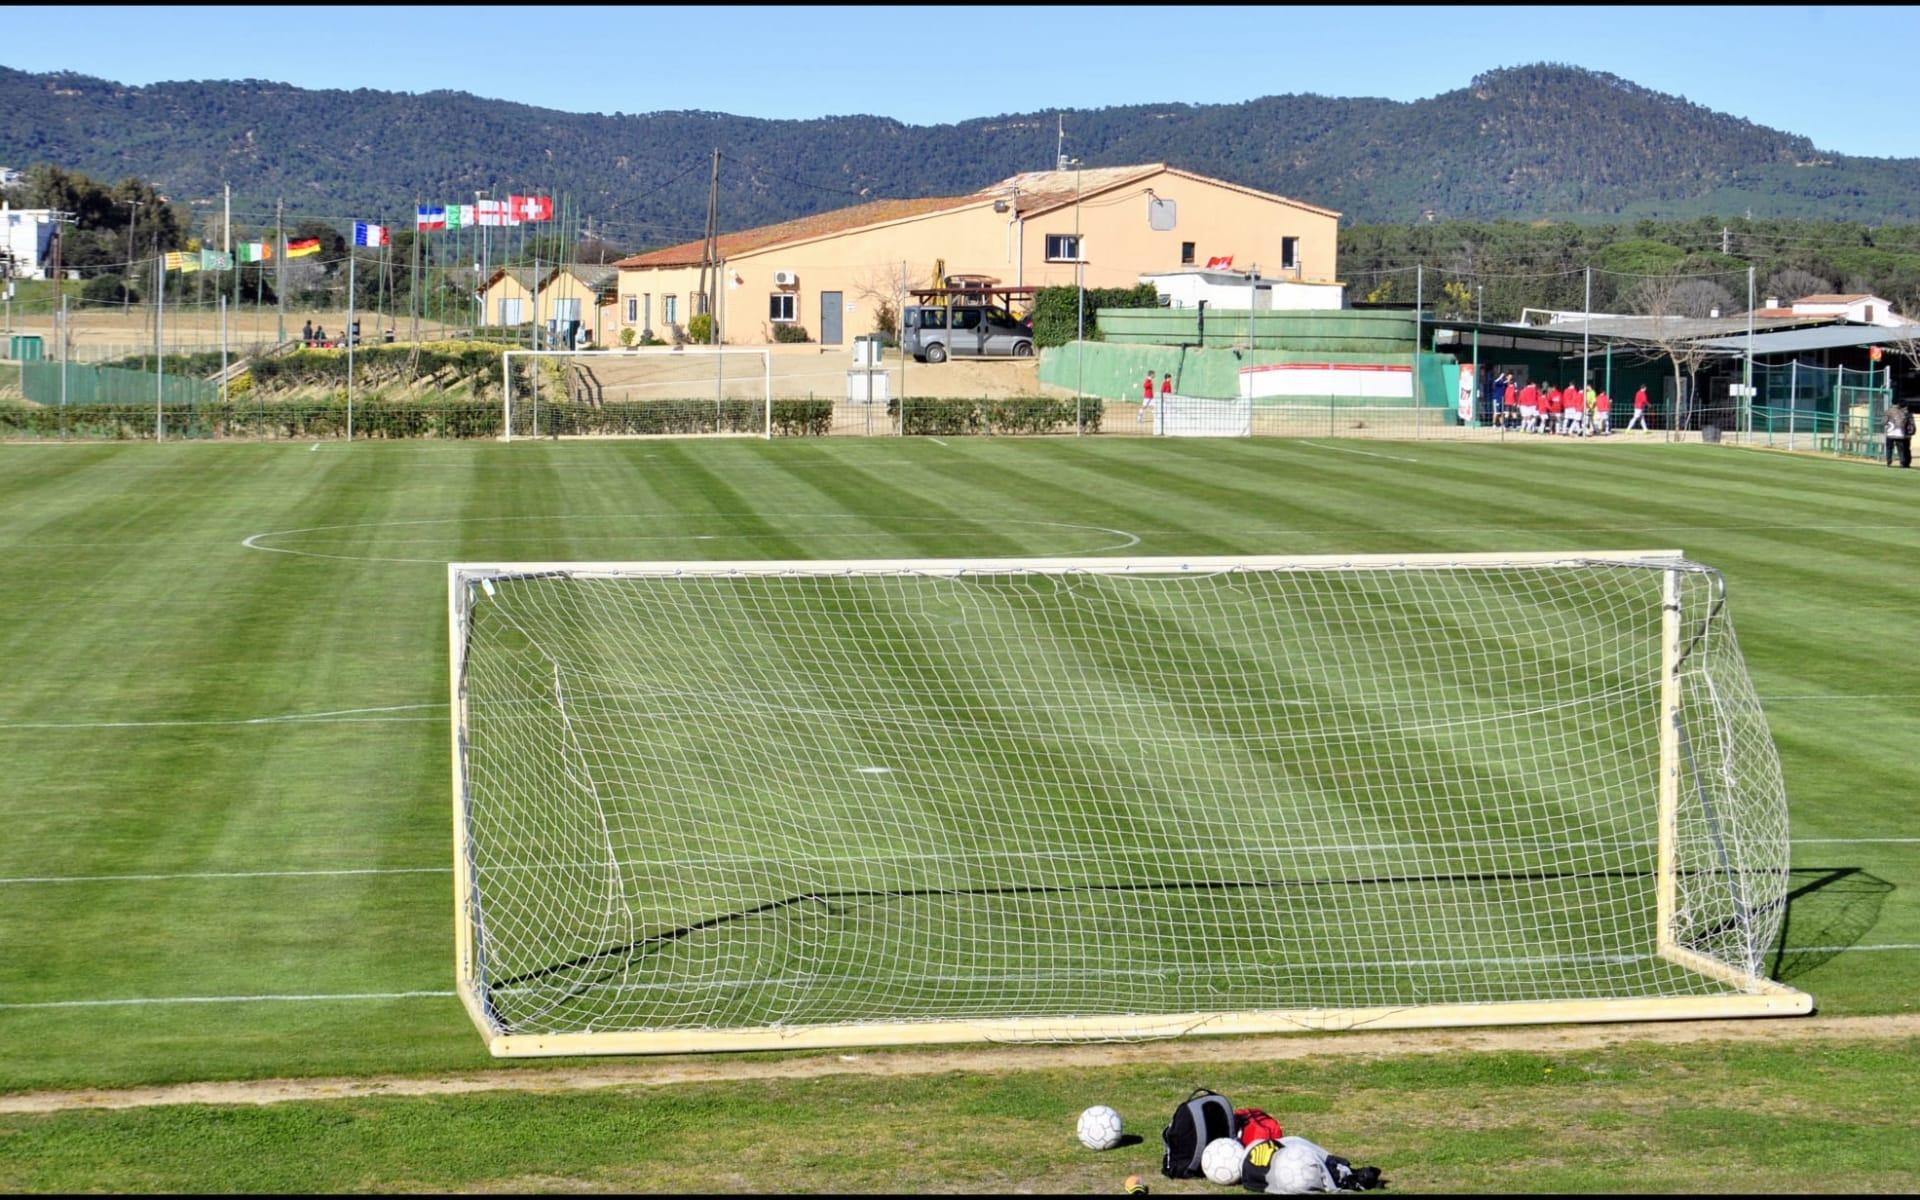 Lloret de Mar - Hotel Olympic Suites & Palace ab Costa Brava: Goal